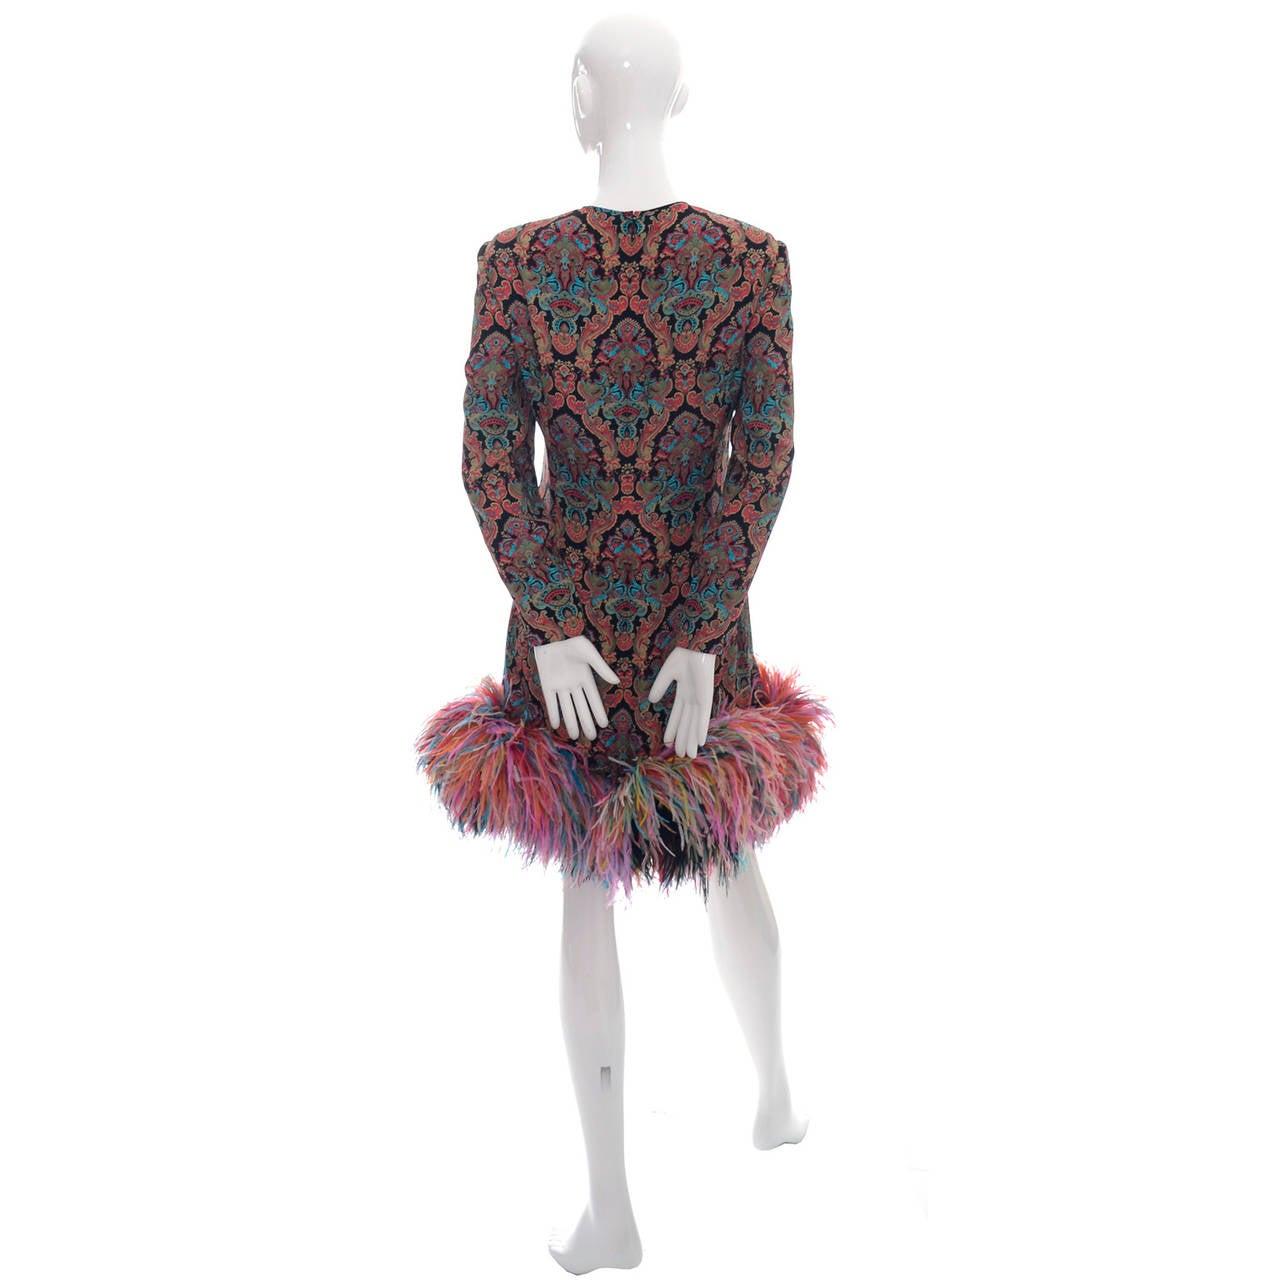 galanos designer vintage dress ostrich feathers 1980s